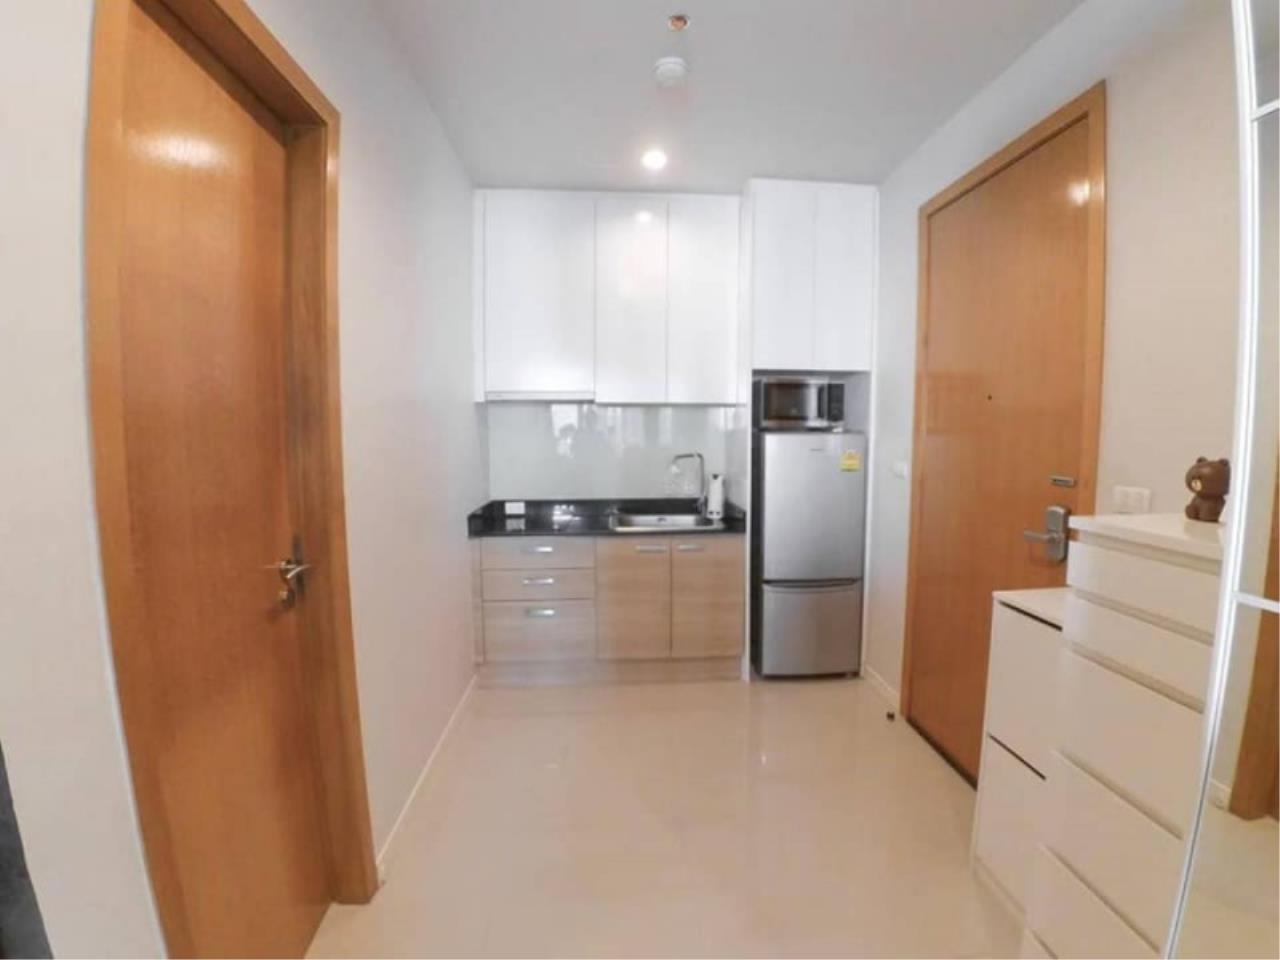 Century21 Skylux Agency's Circle Condominium / Condo For Sale / 1 Bedroom / 33.51 SQM / MRT Phetchaburi / Bangkok 4